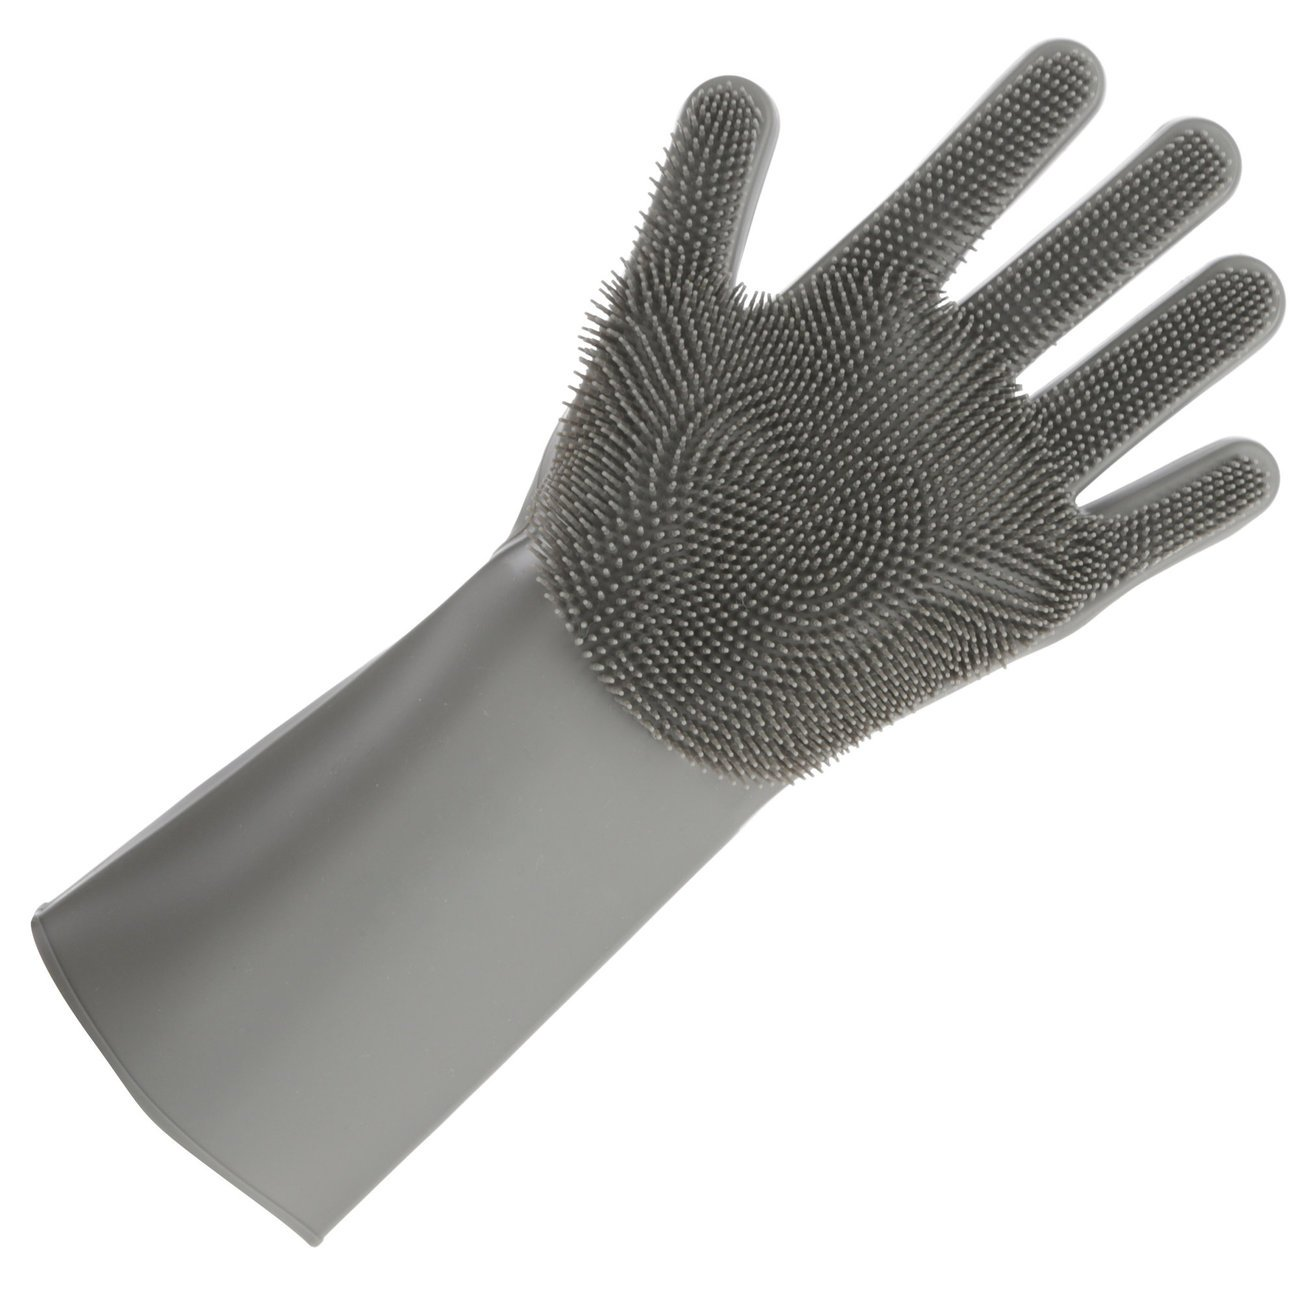 Kerbl Pferde Putz Waschhandschuh aus Silikon Preview Image